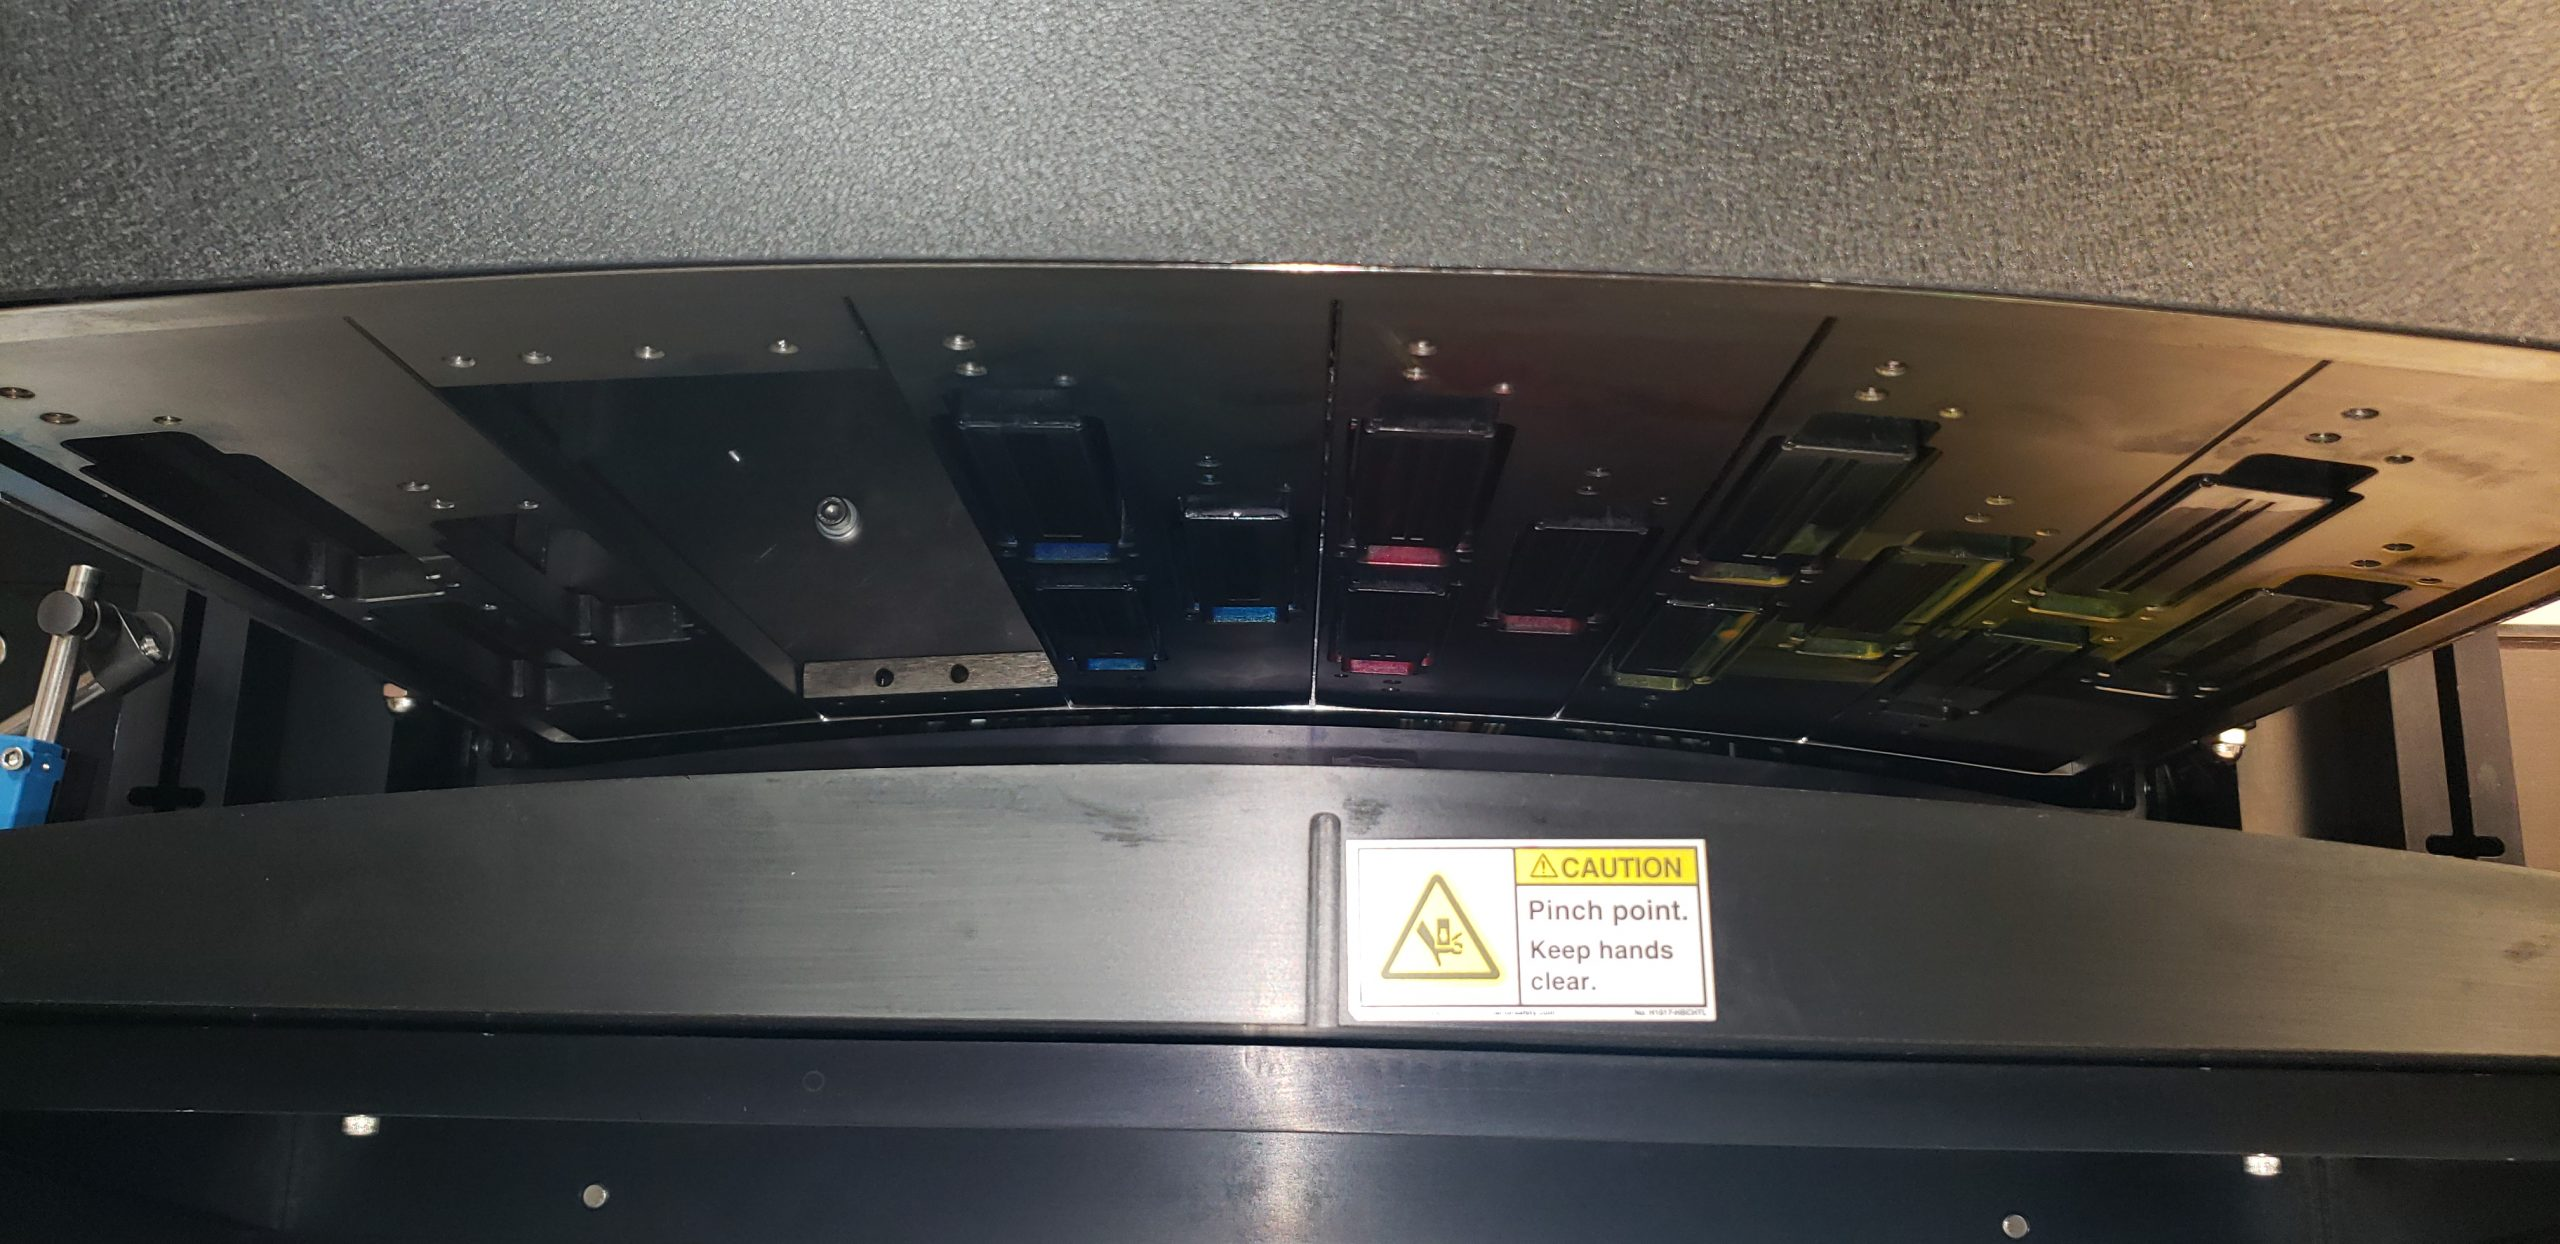 EFI Jetrion 4830 - Used Flexo Printing Presses and Used Flexographic Equipment-5